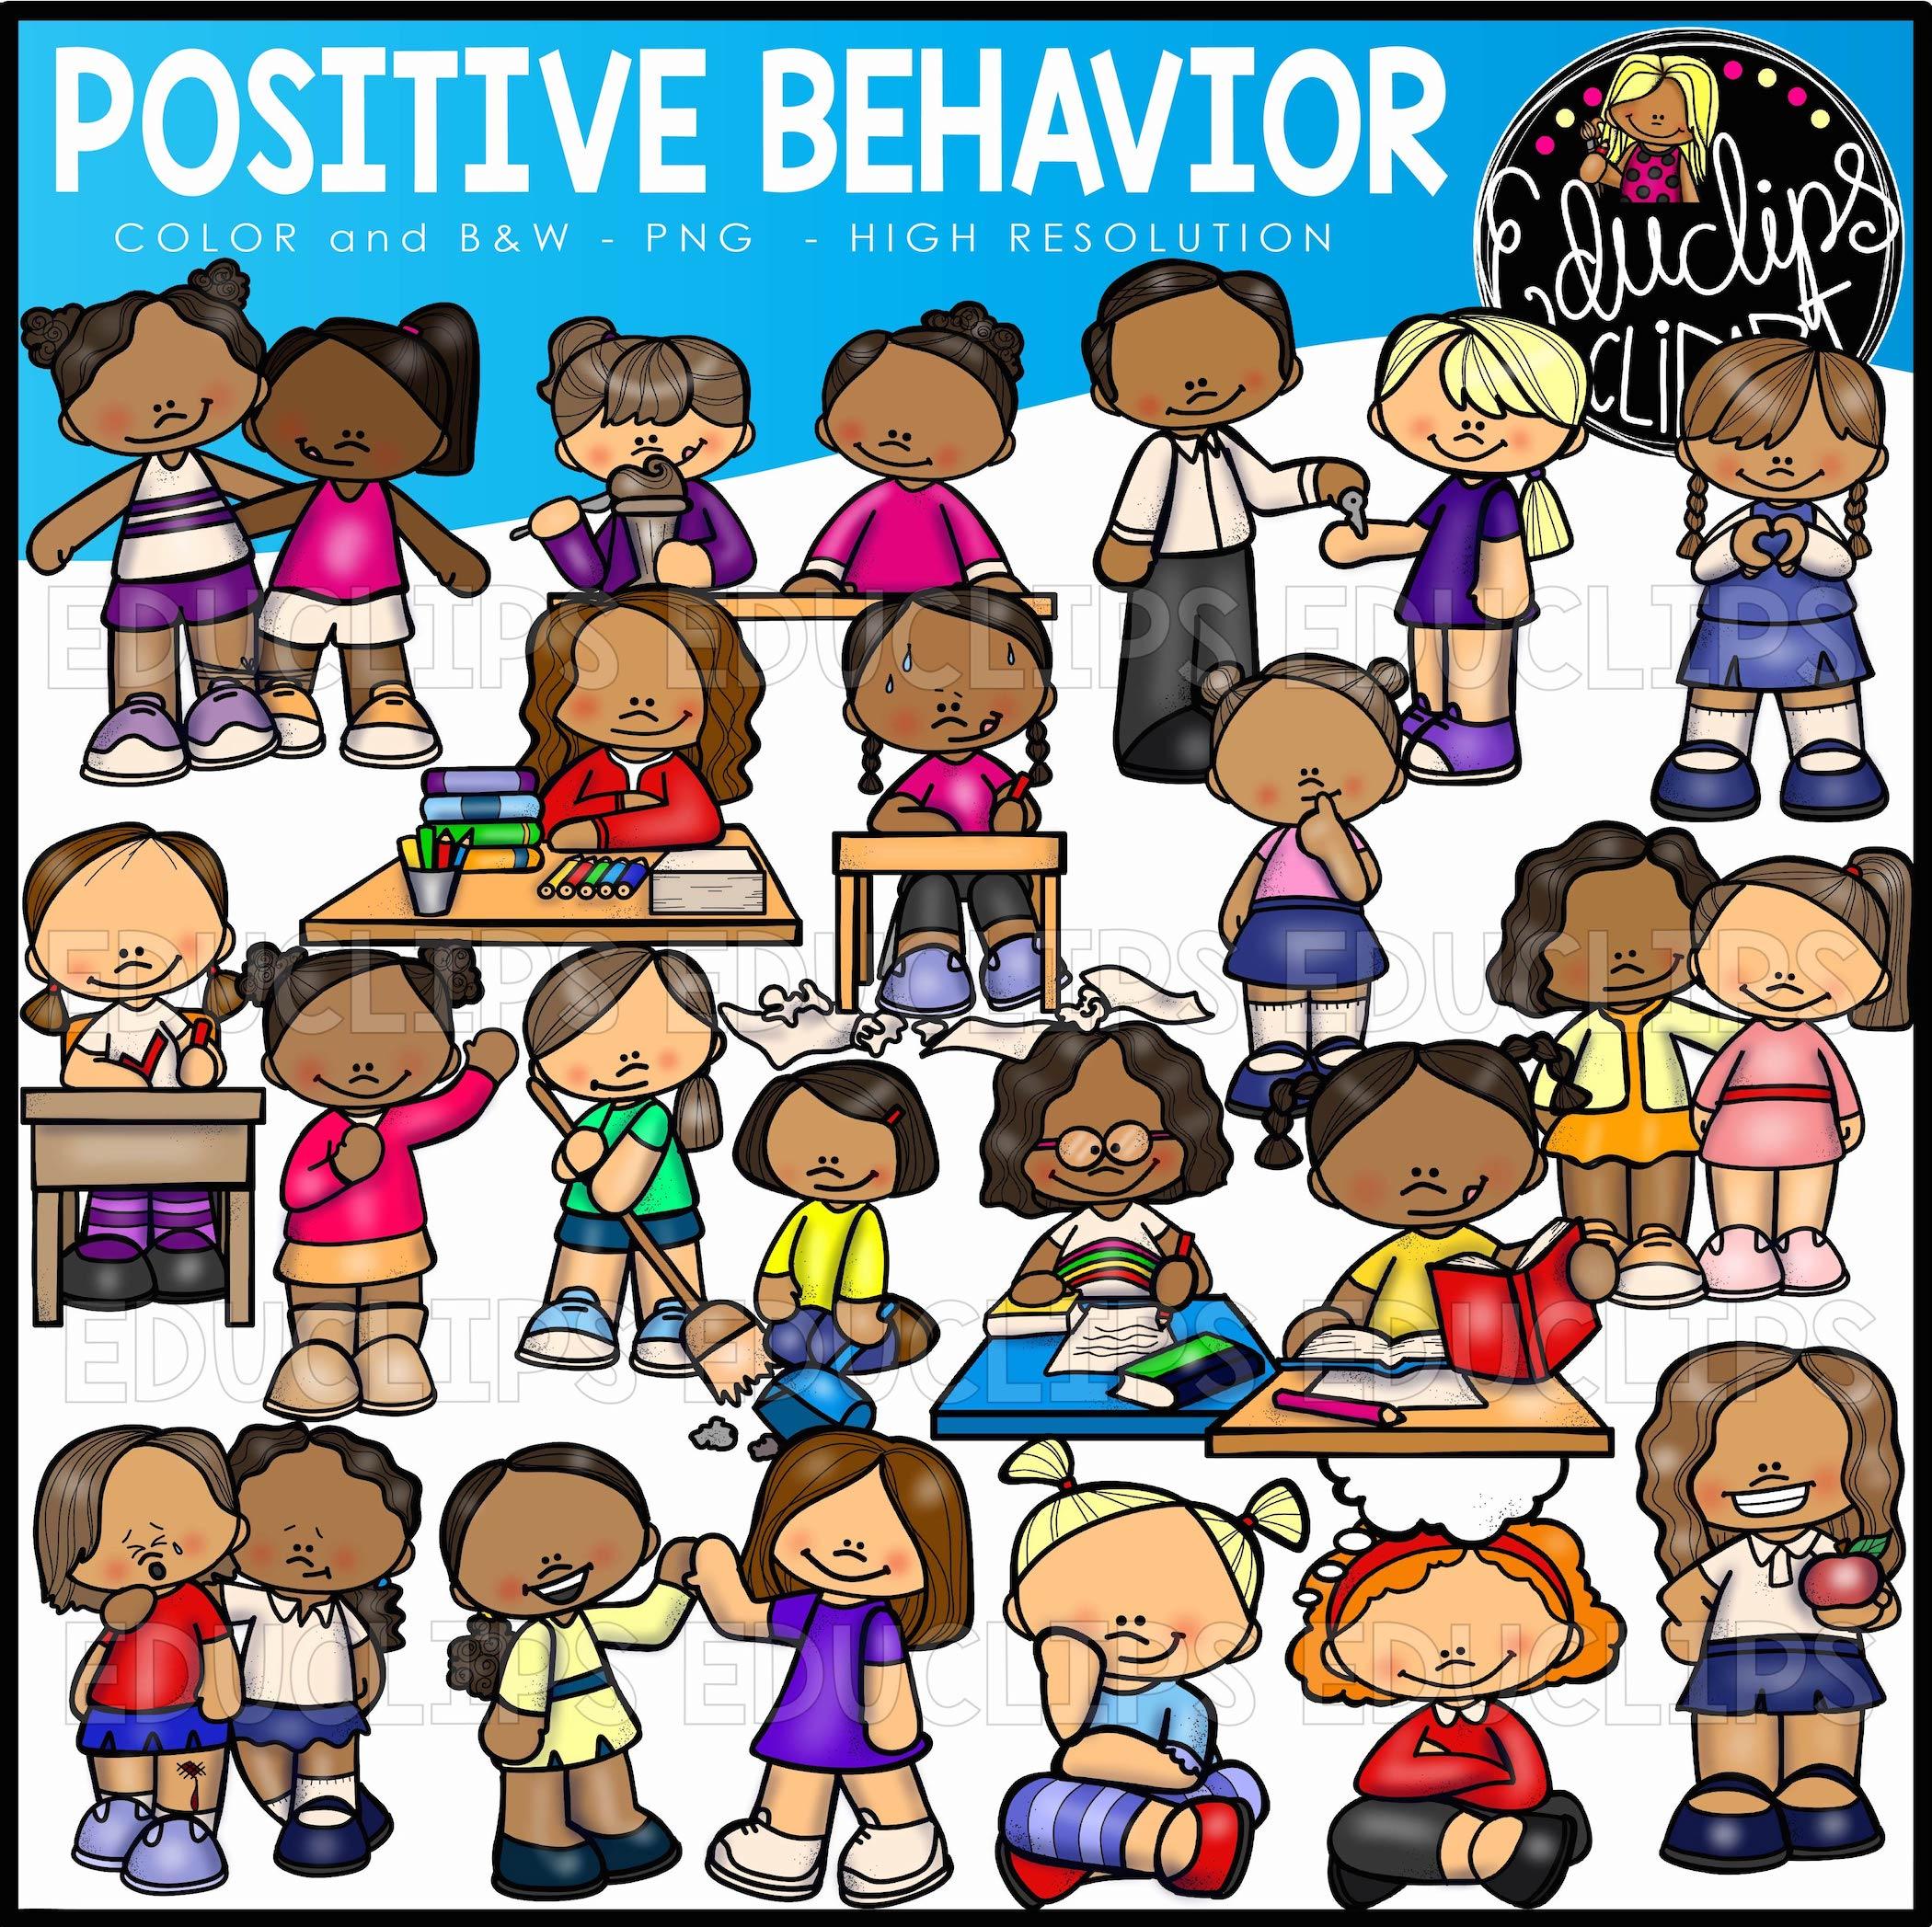 Positive & Negative Behavior Clip Art Big Bundle (Color and B&W).